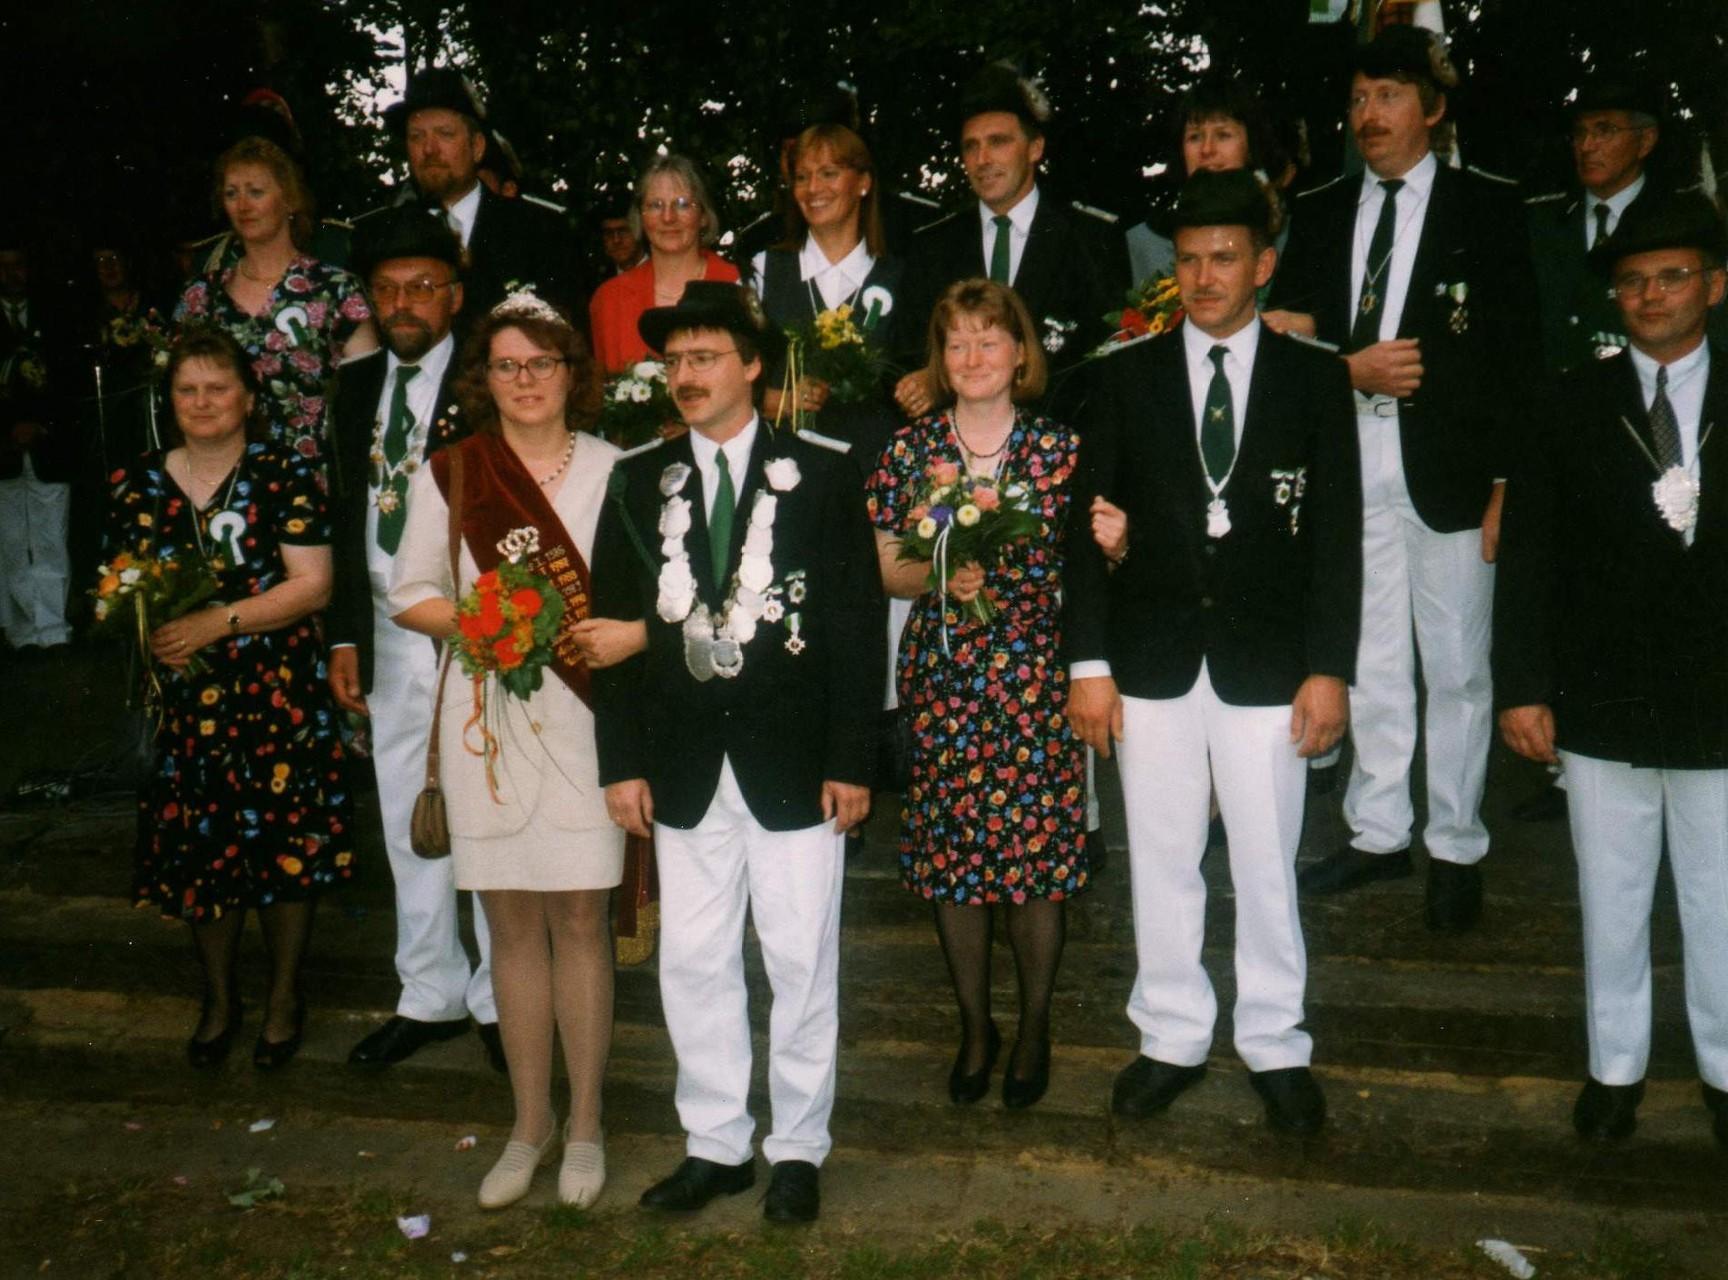 1995: König Walter Straßburger und Königin Hannelore Straßburger